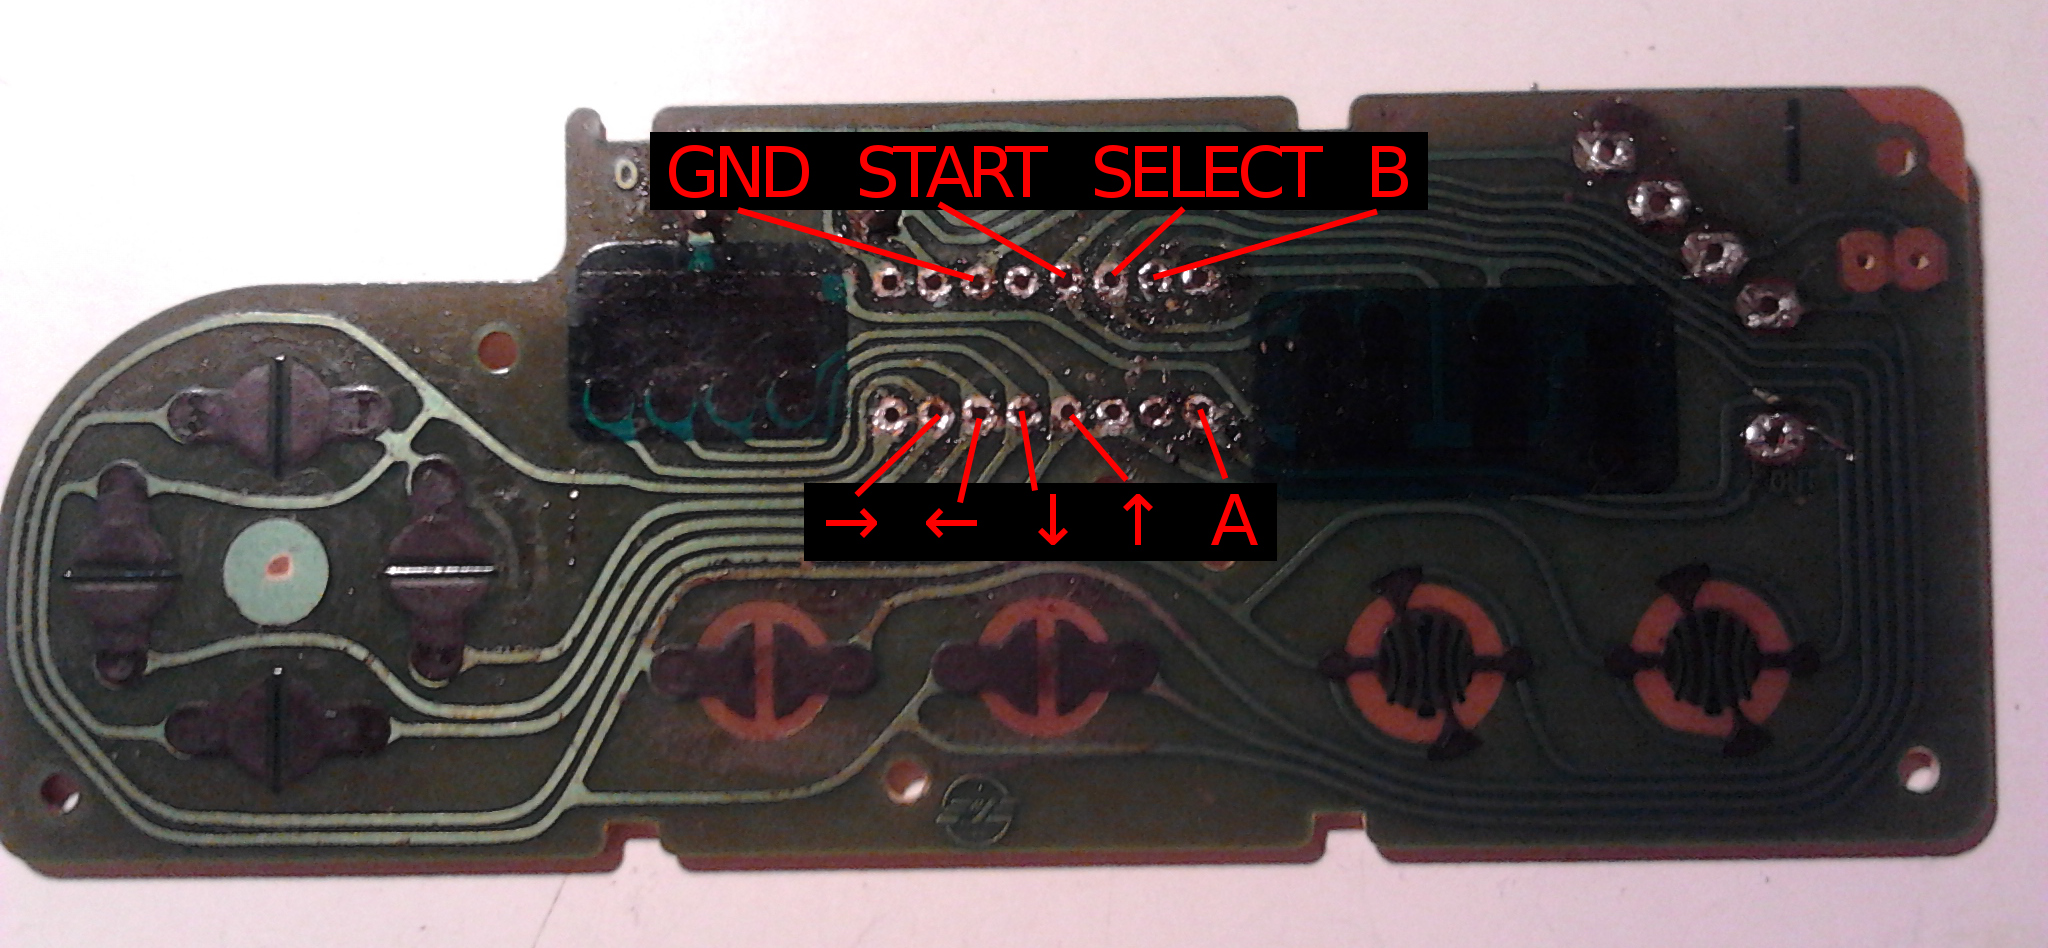 NES controller USB modification